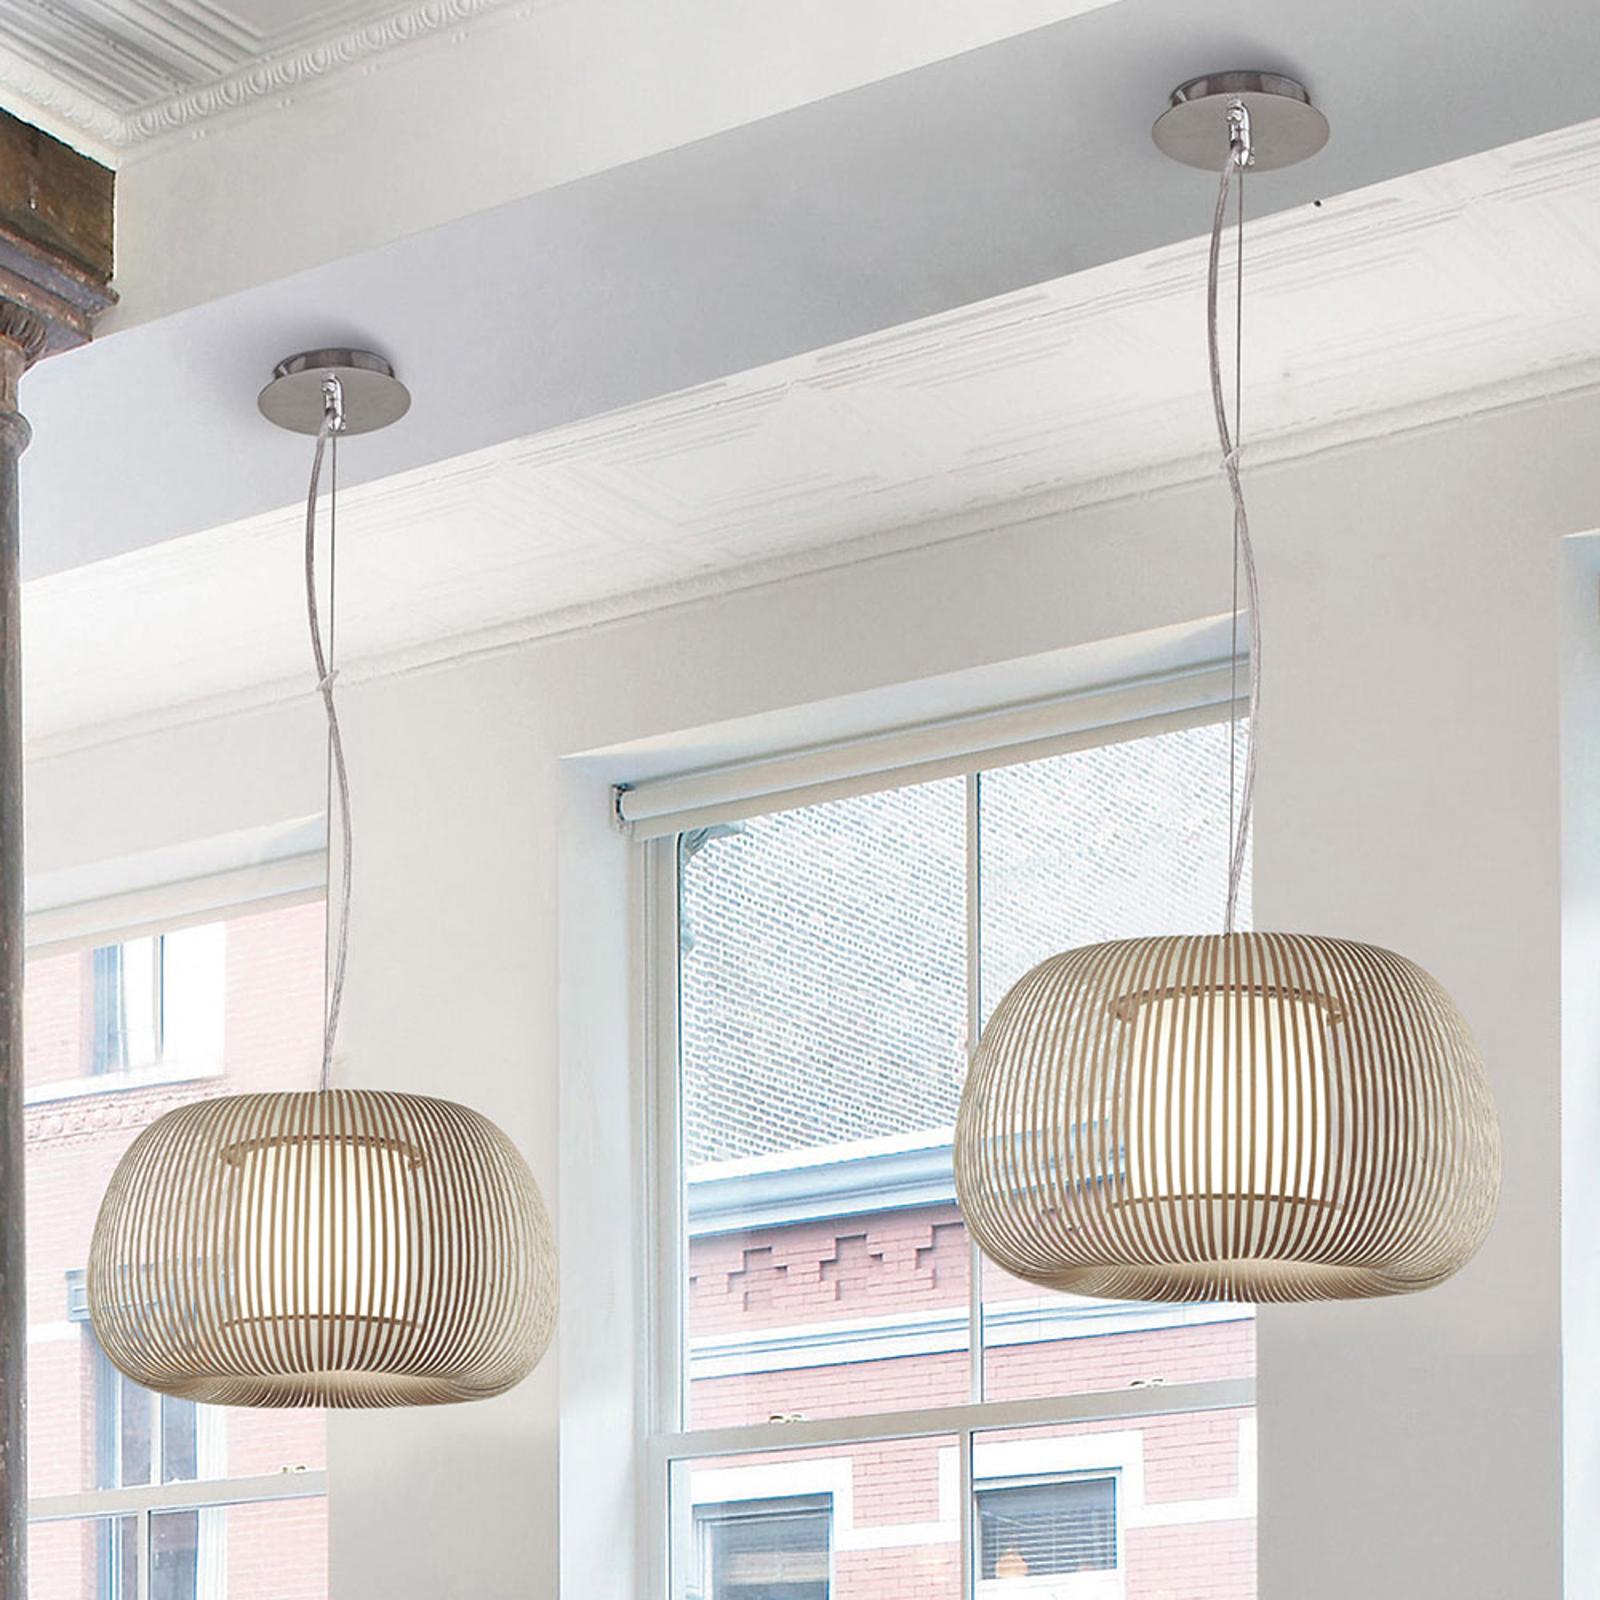 Hanglamp Mirta, steengrijs, Ø 45 cm